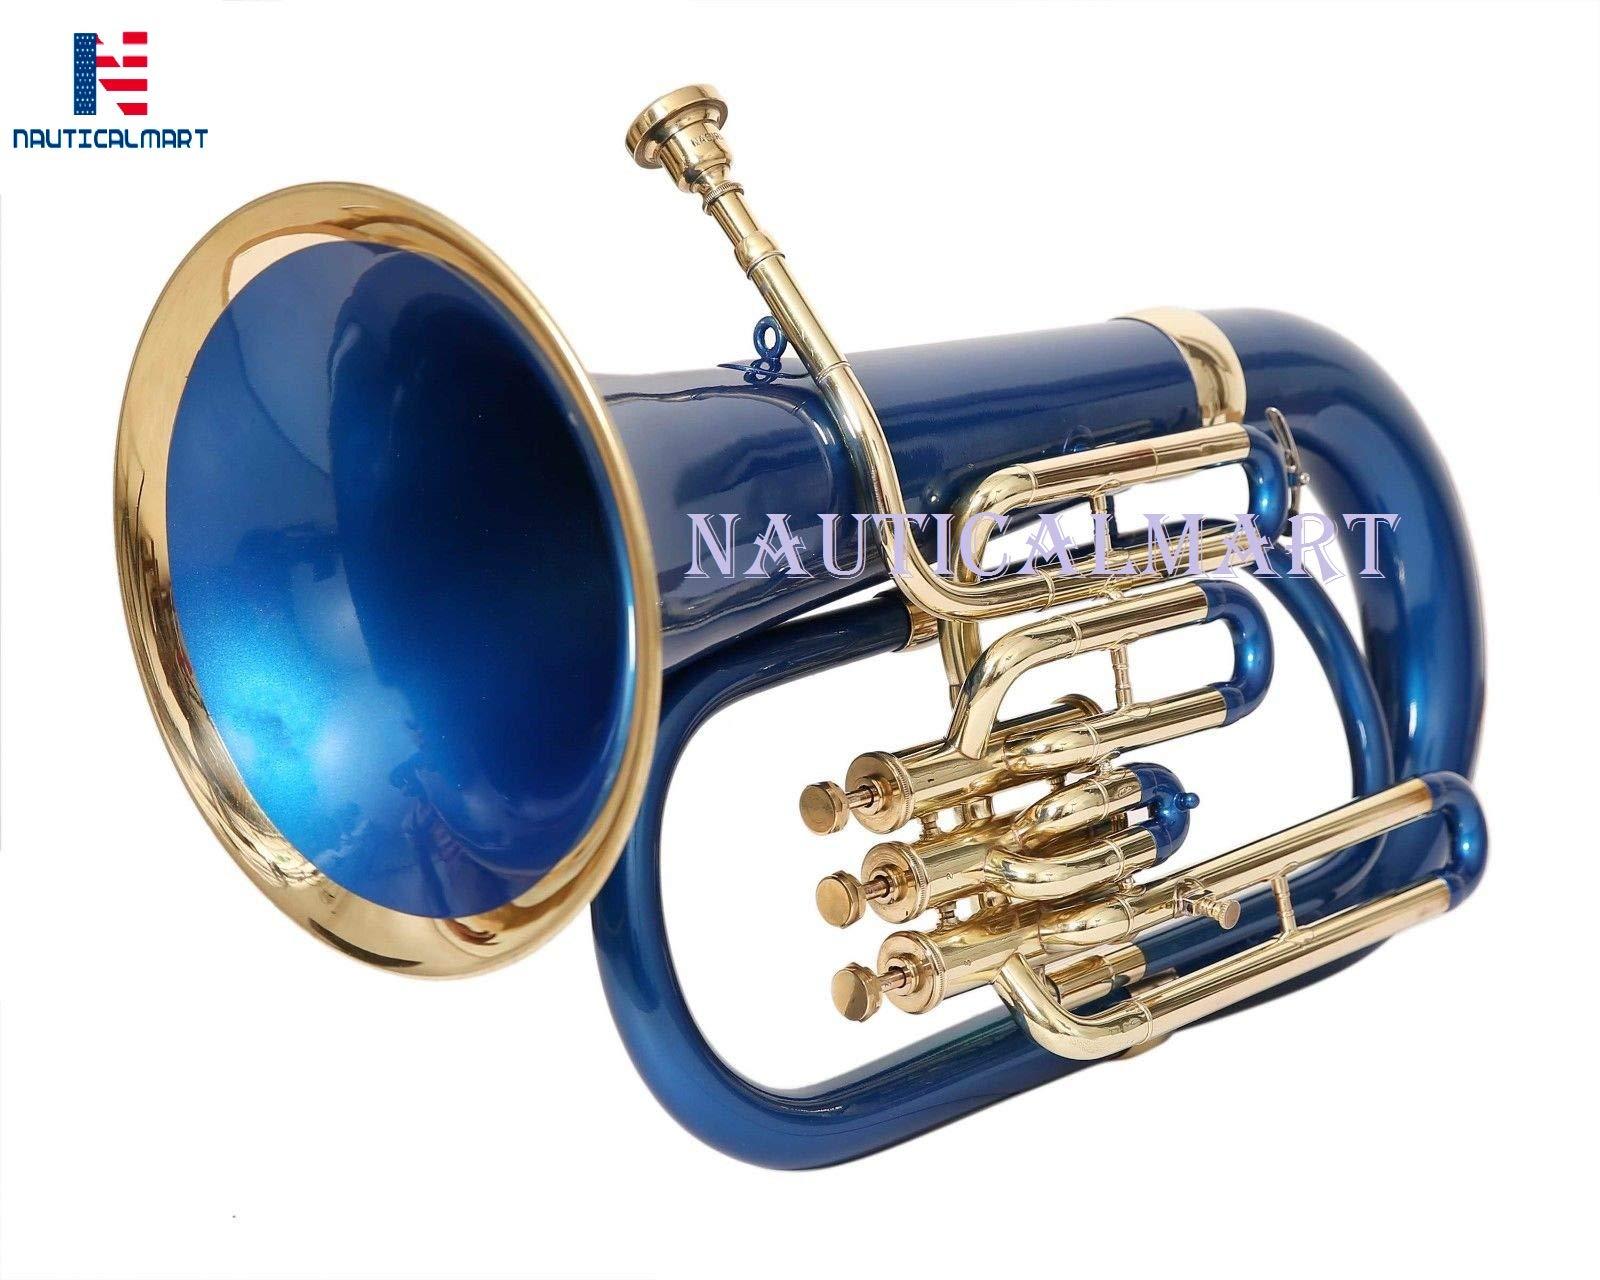 NauticalMart Brass Bb Euphonium 3 Valve - Blue